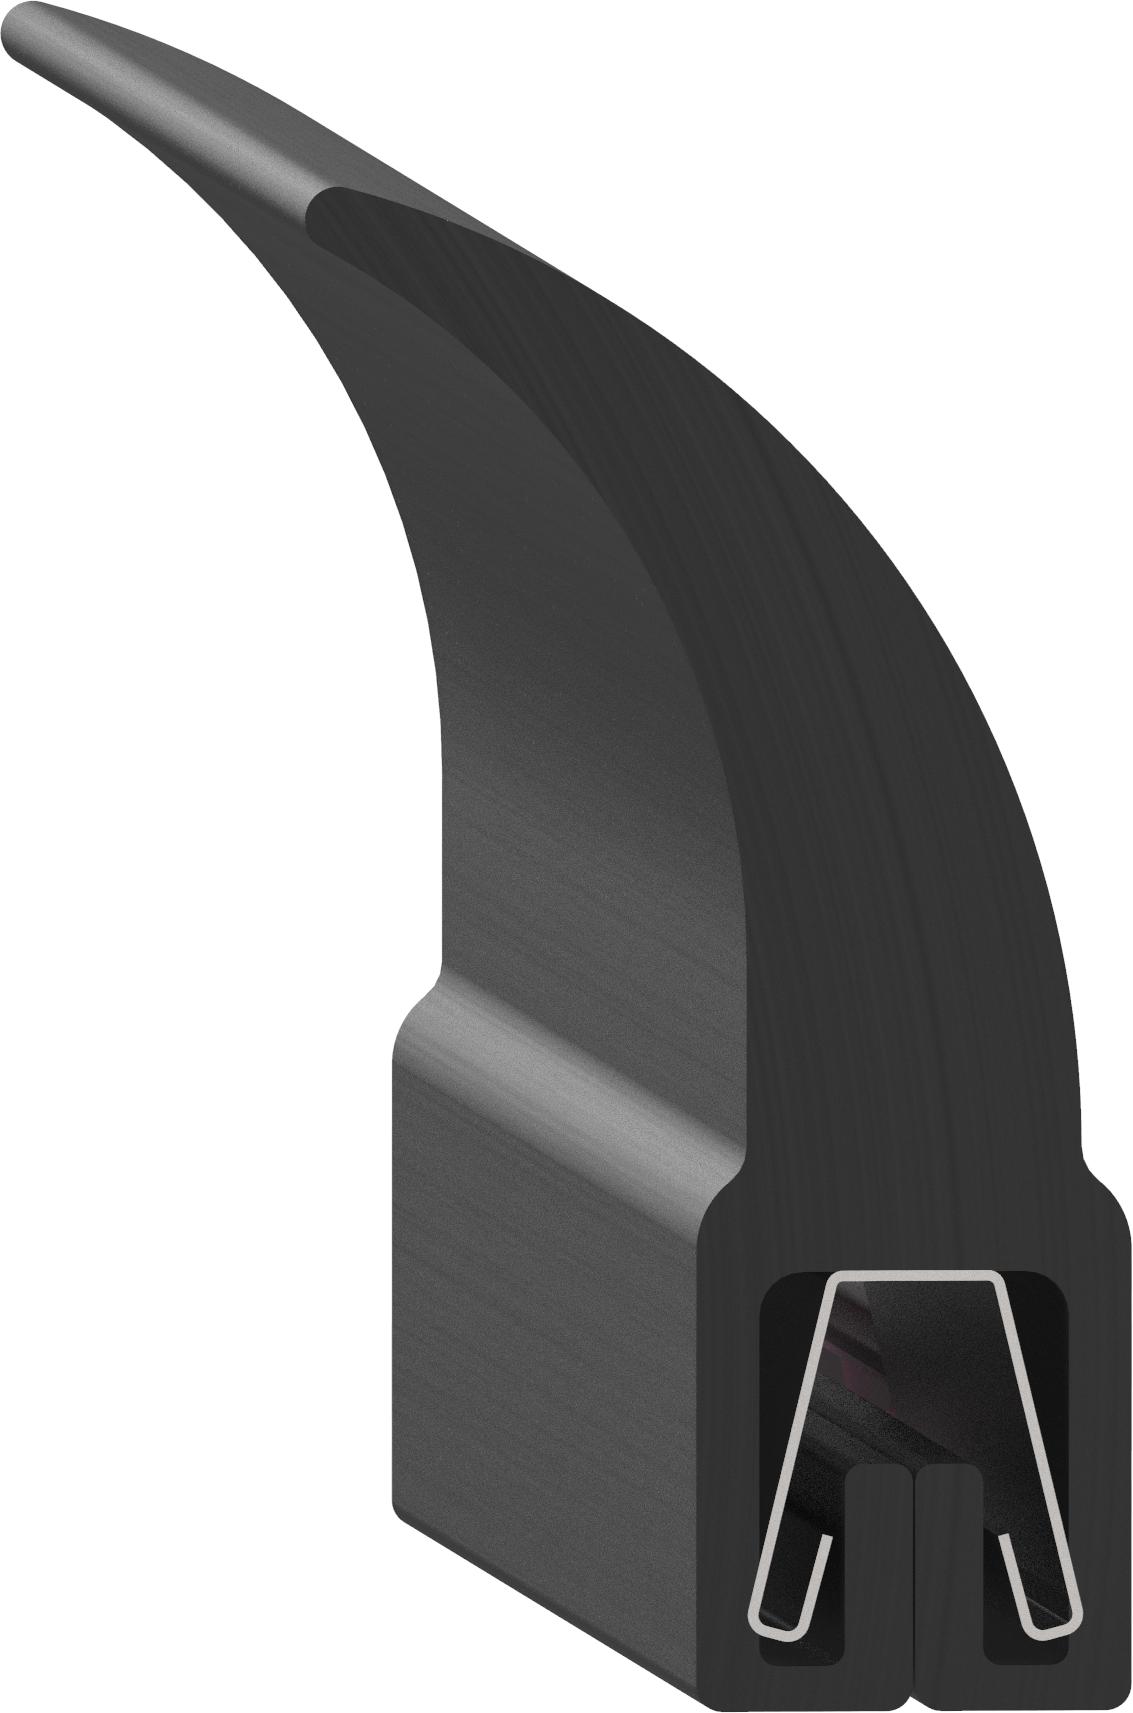 Uni-Grip part: ED-5364